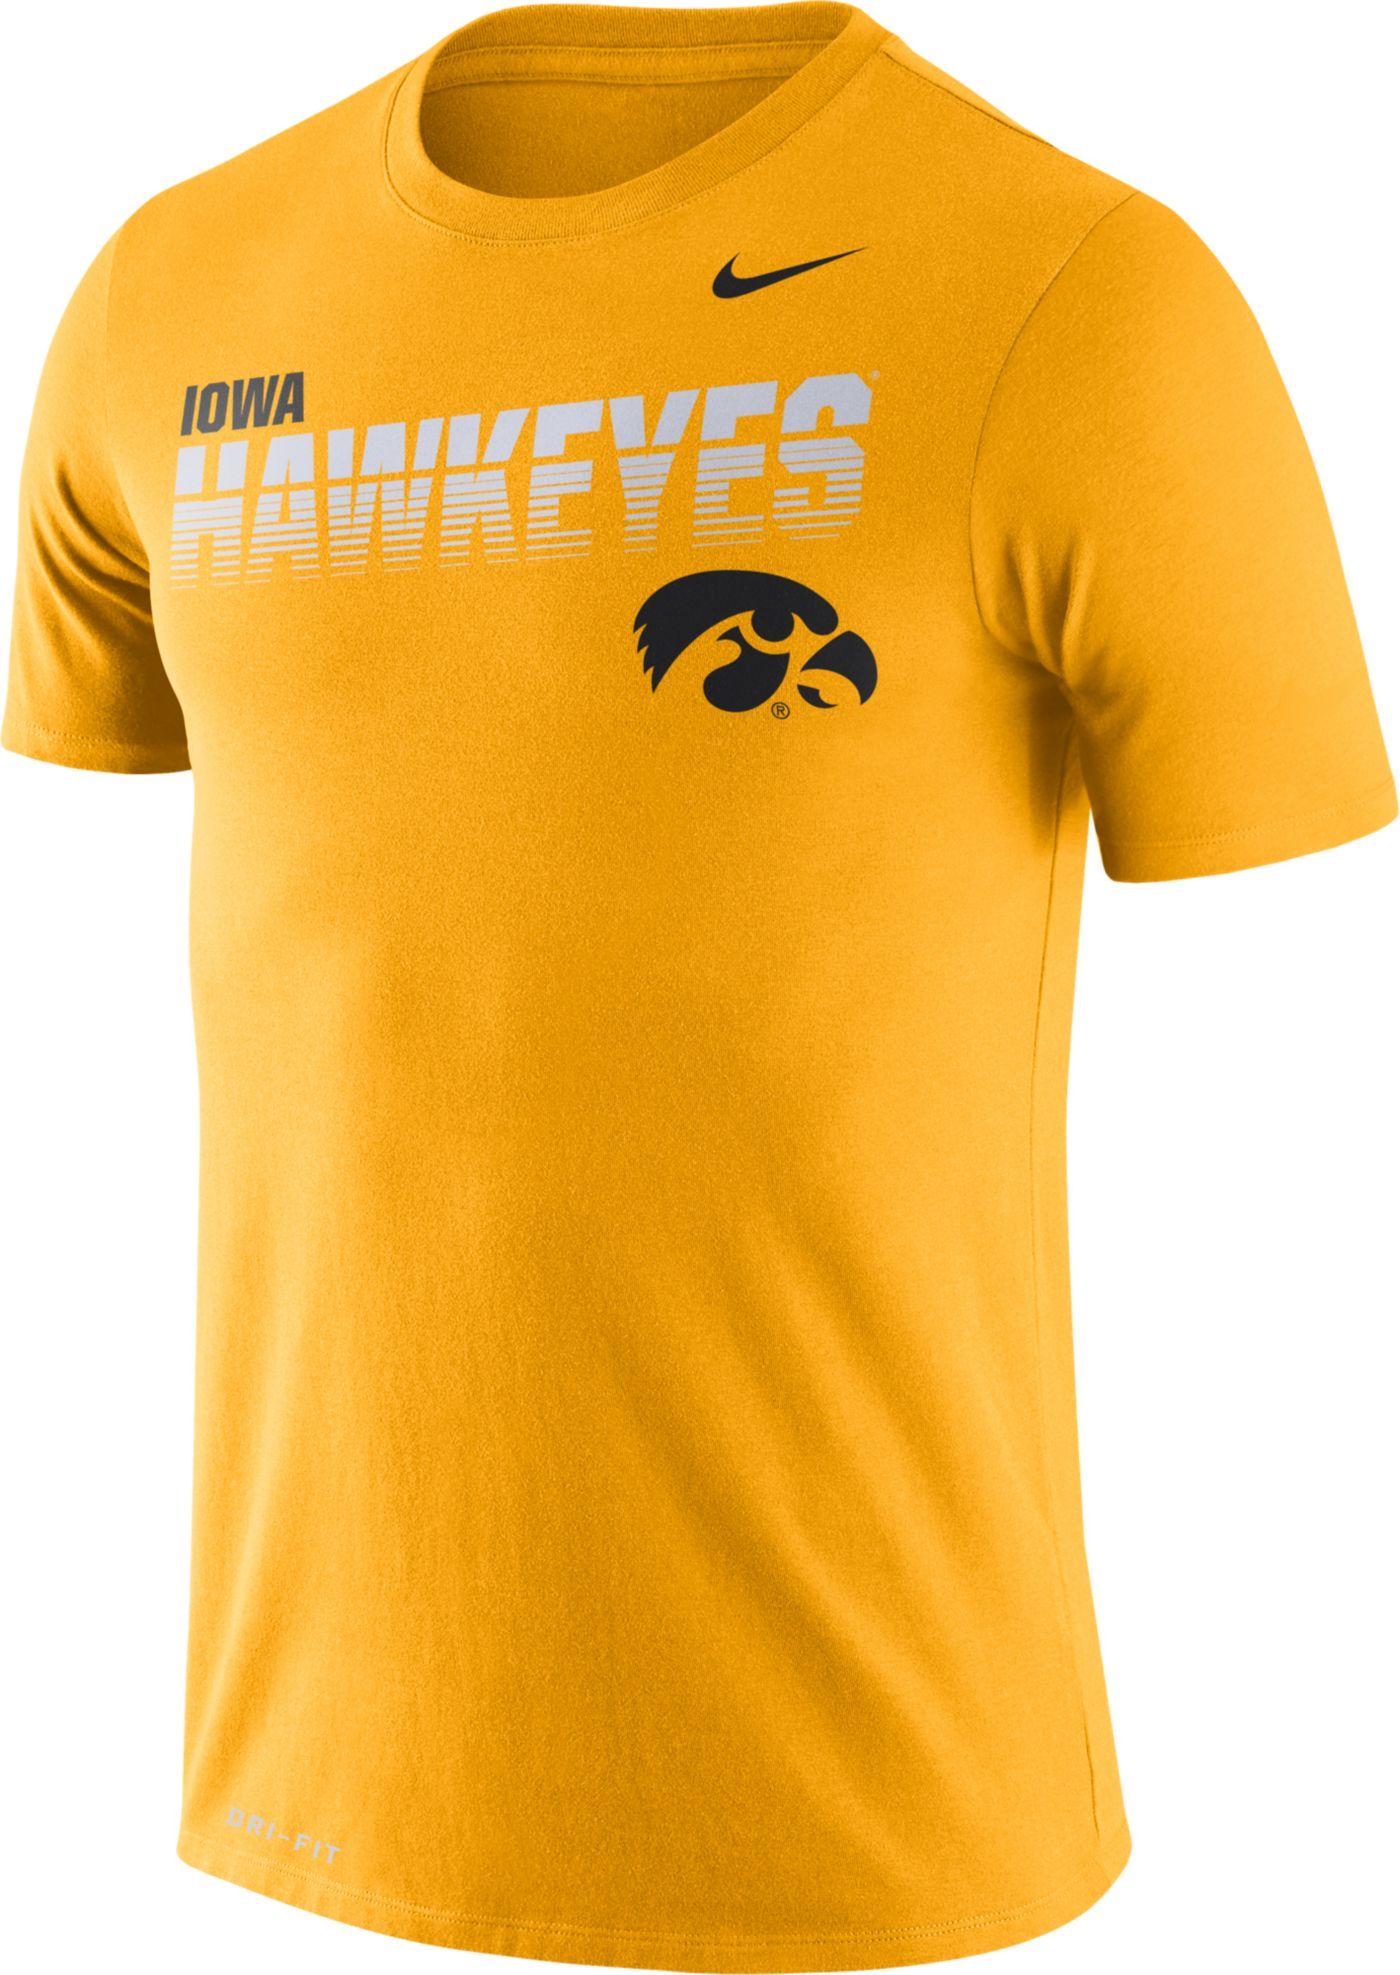 Nike Men's Iowa Hawkeyes Gold Legend Football Sideline T-Shirt